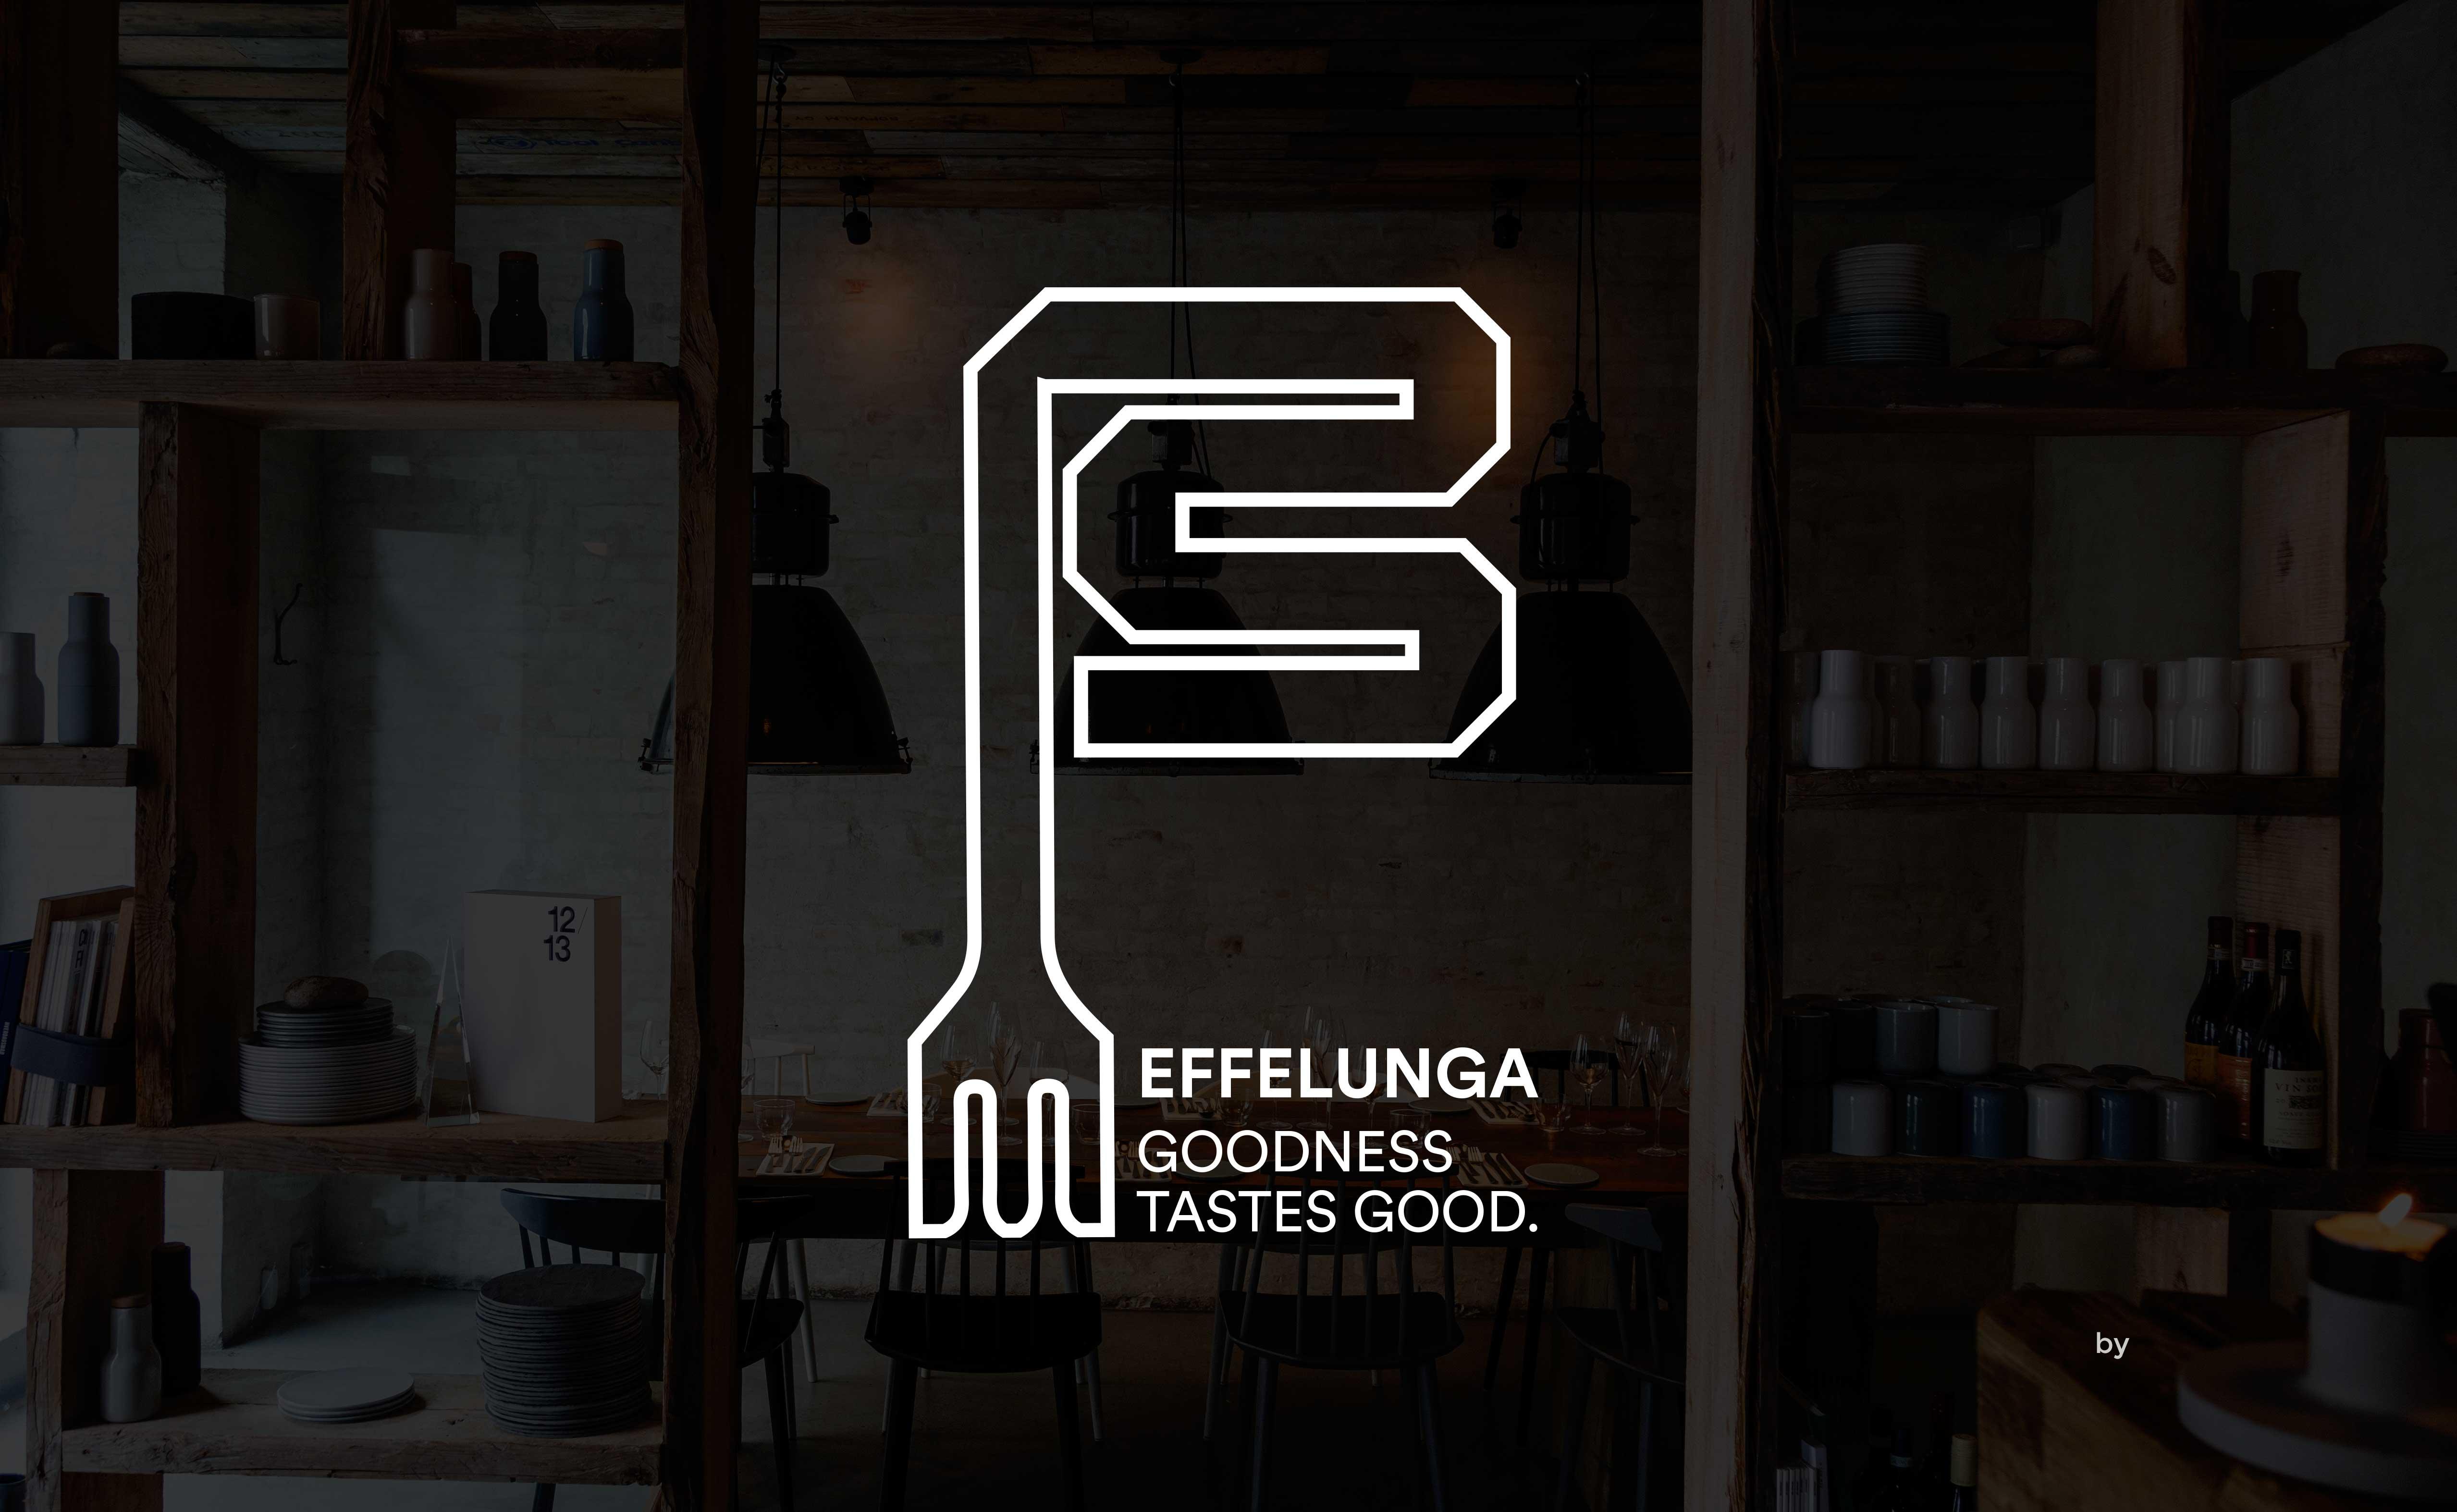 Effelunga - Goodness tastes good.